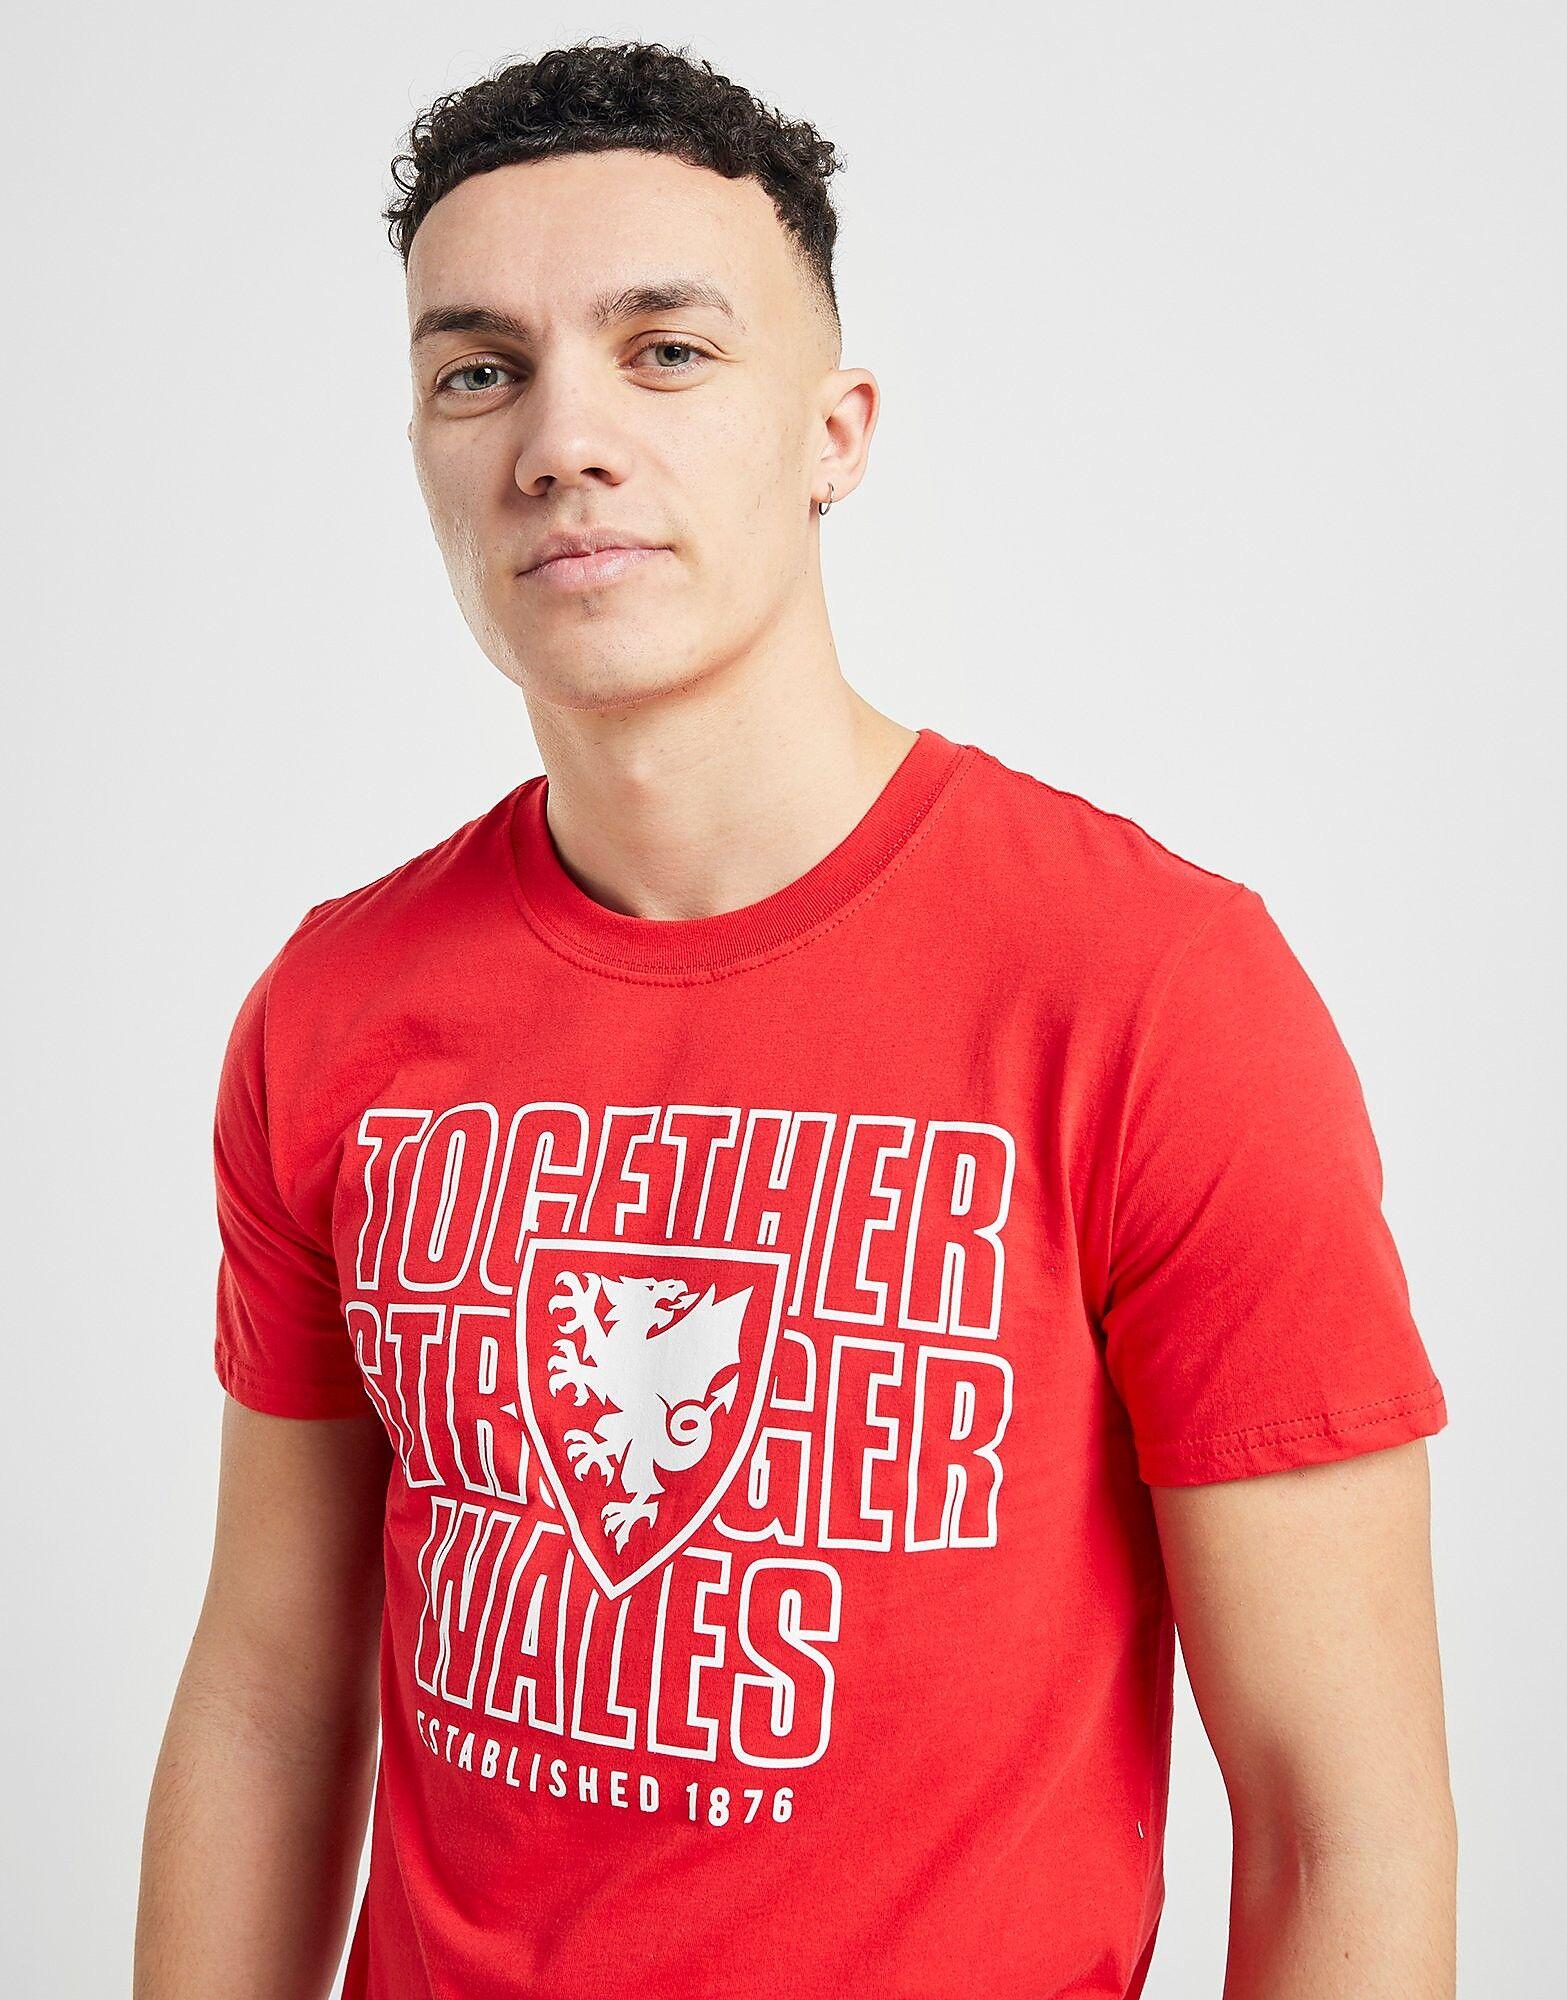 Official Team Wales Together T-paita Miehet - Mens, Punainen